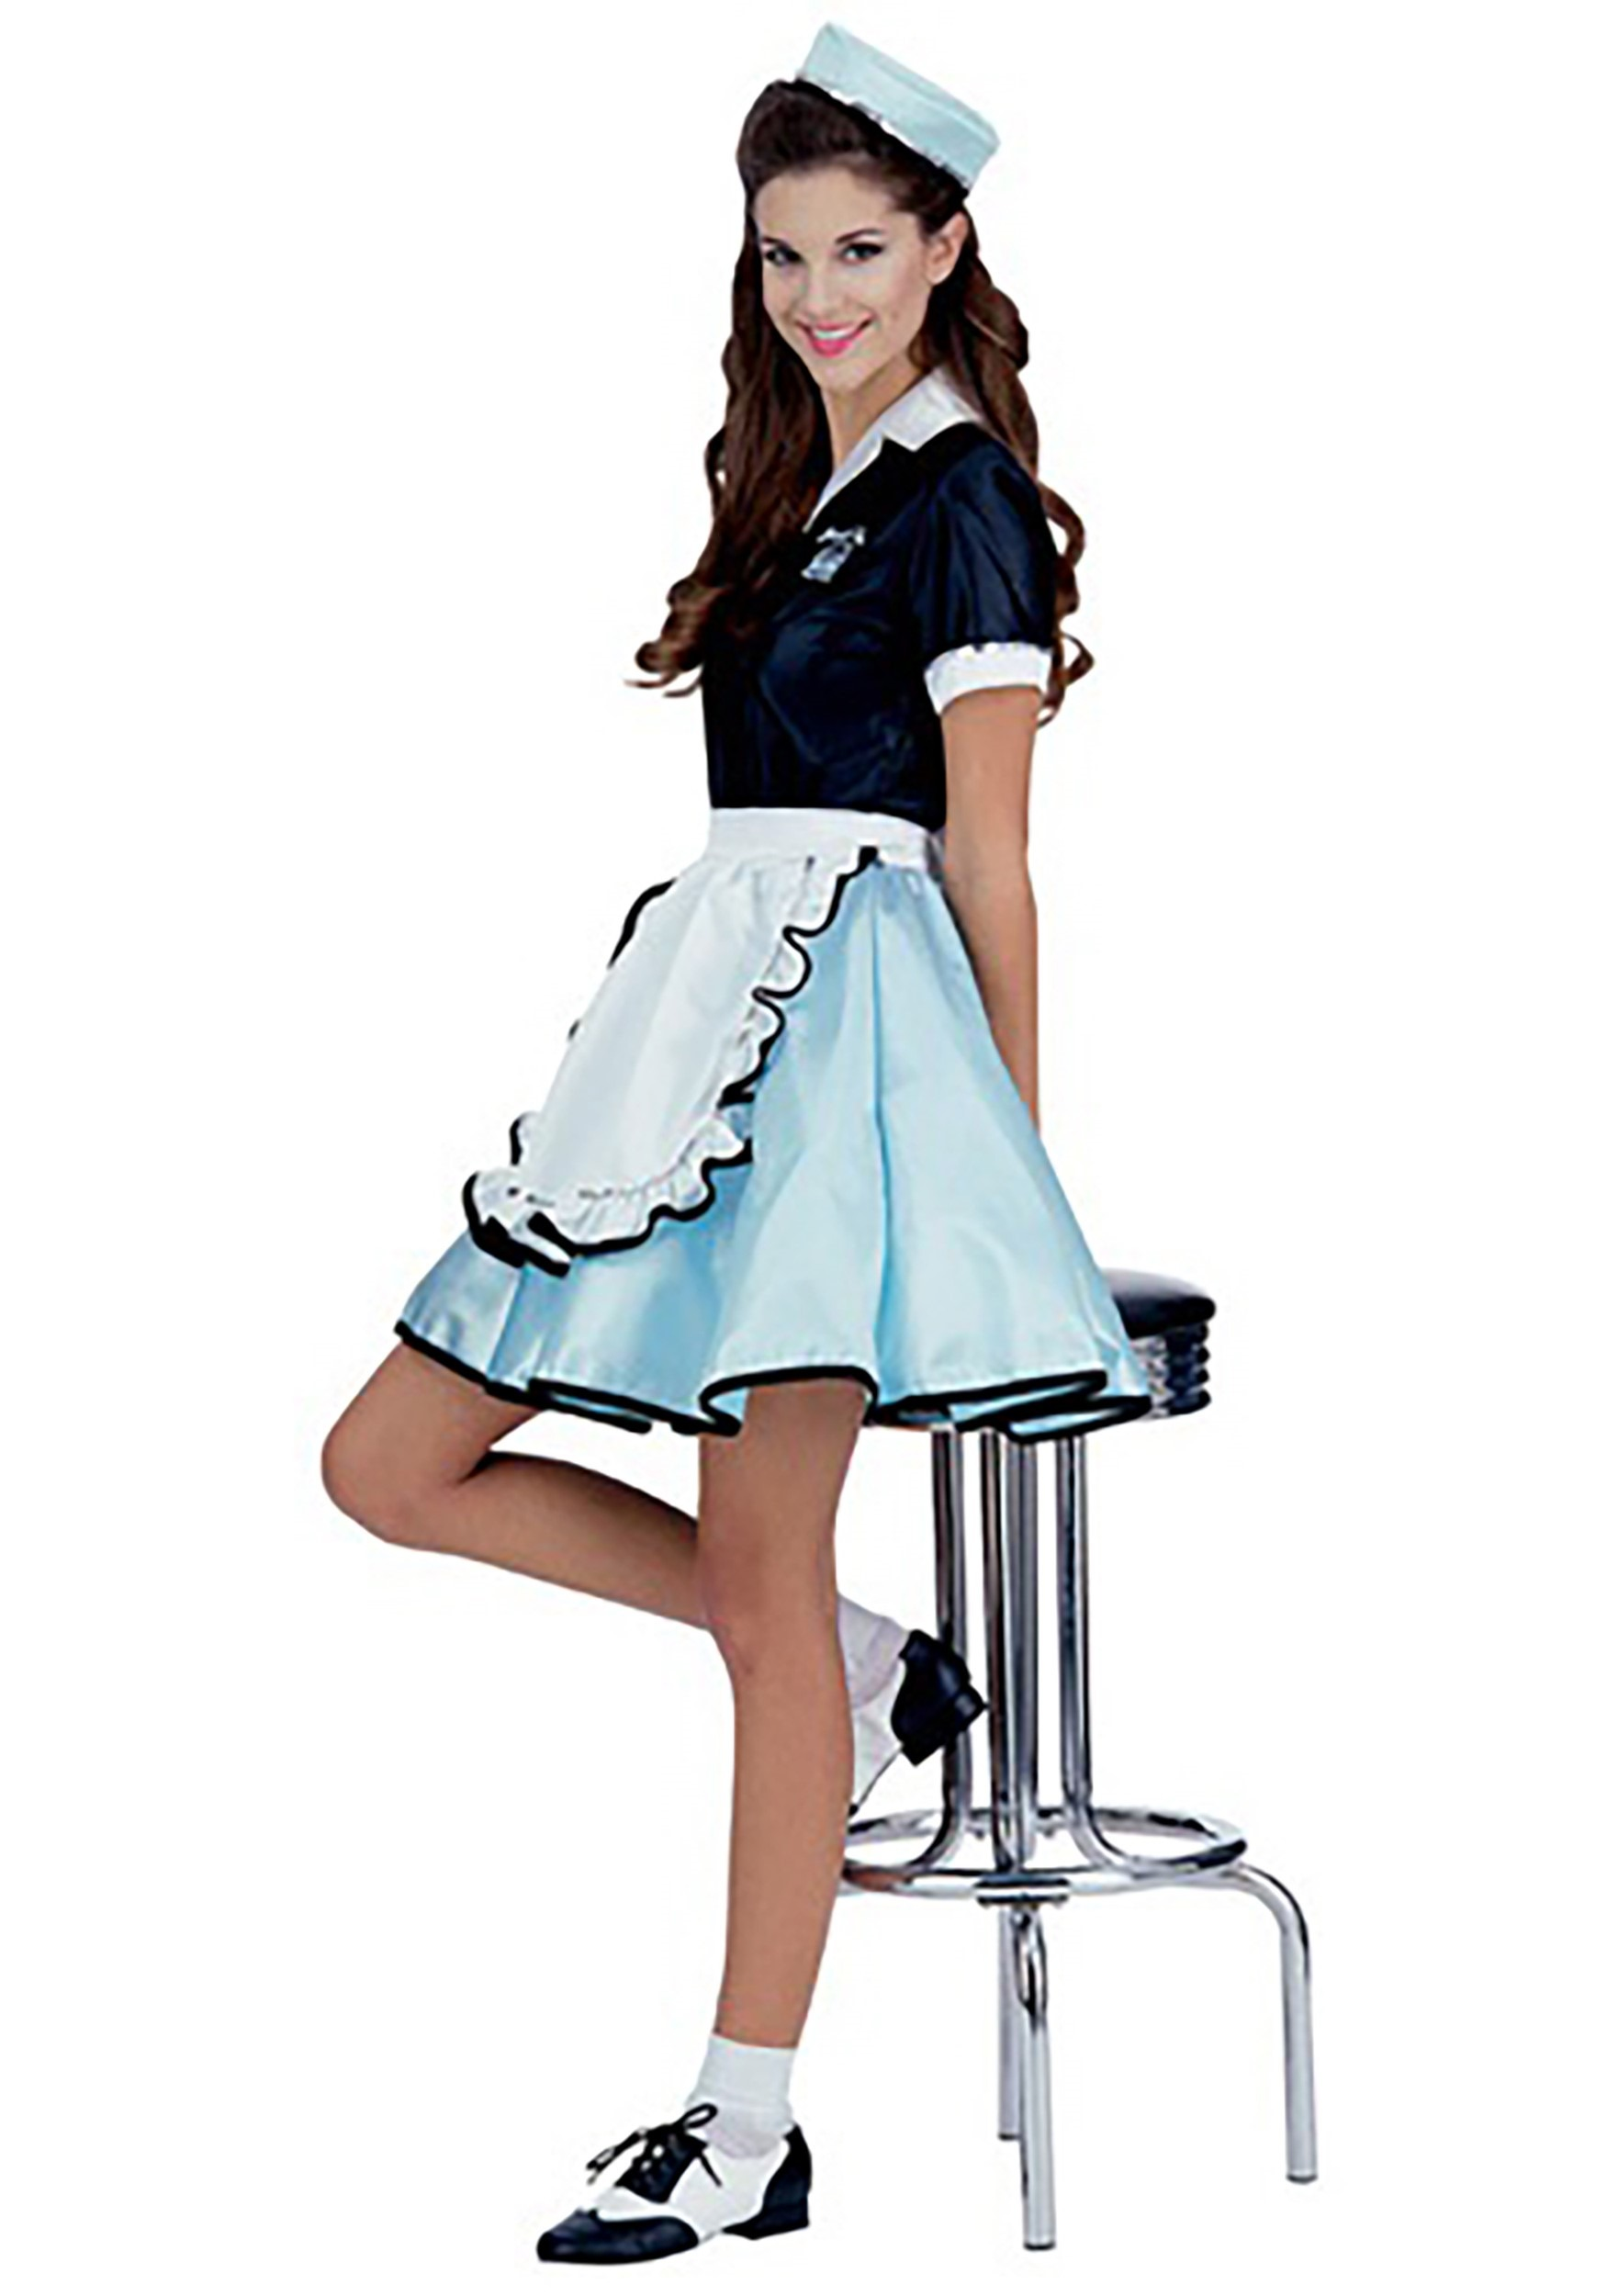 fad428eb9578 Car Hop Girl Costume for Women- 1950s Car Hop Girl Costume Ideas